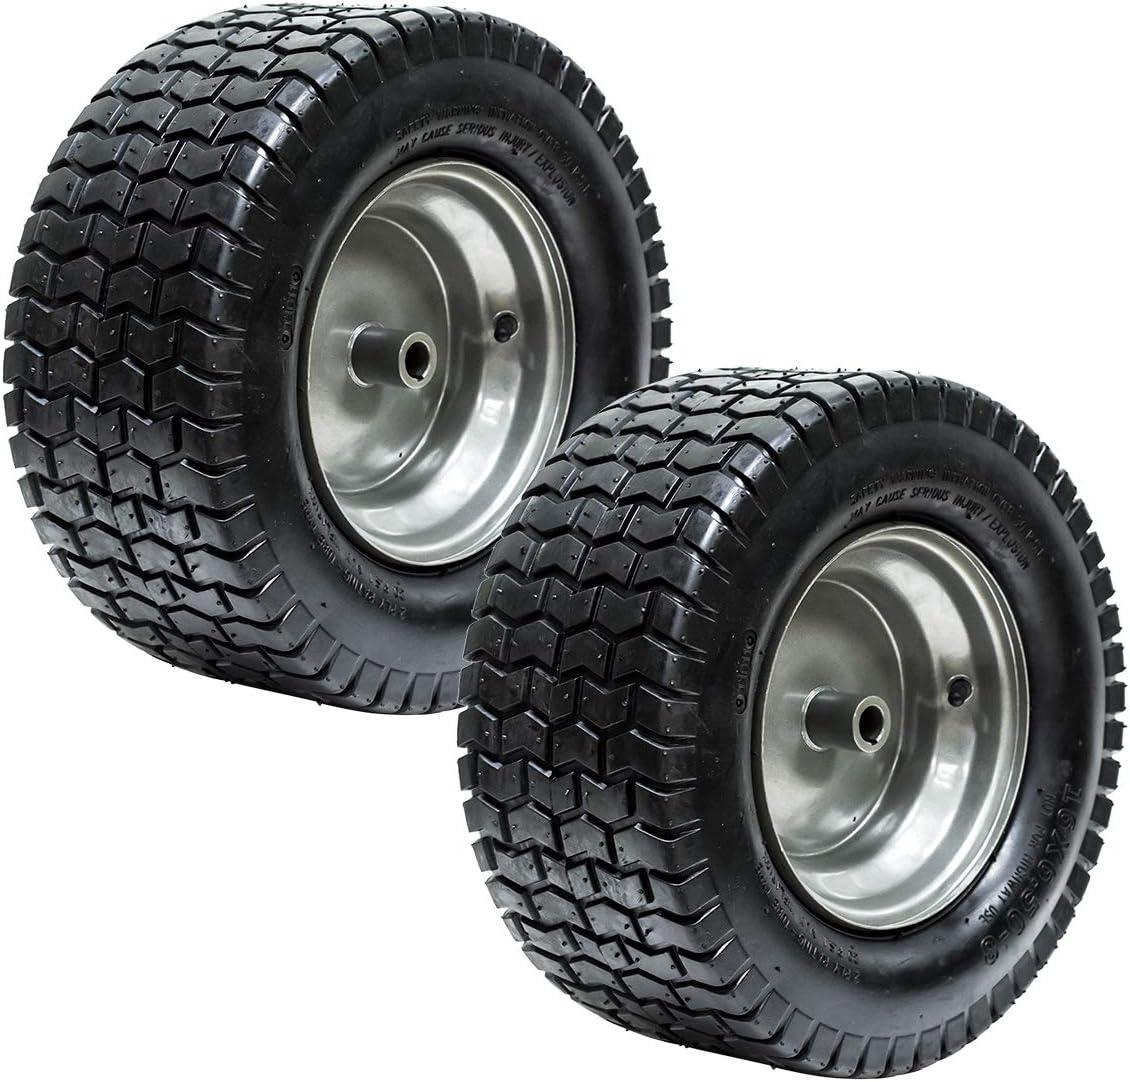 EPR (2) 16x6.50-8 Turf Tire Riding Mower Tractor Rim Wheel Assembly 3/4